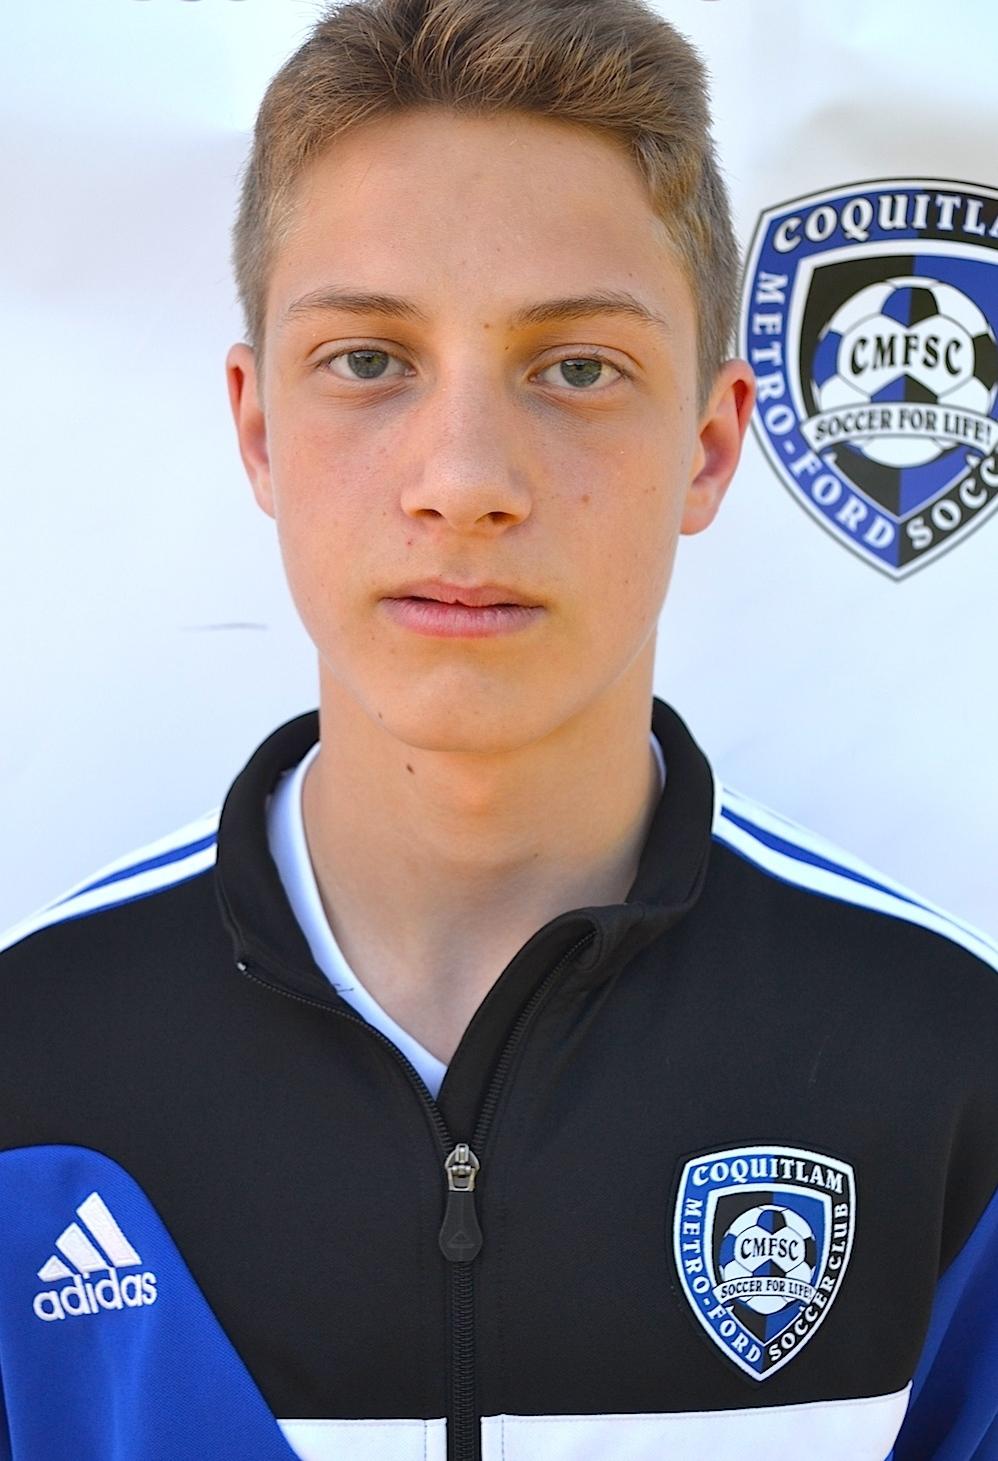 Lucas McIlveen